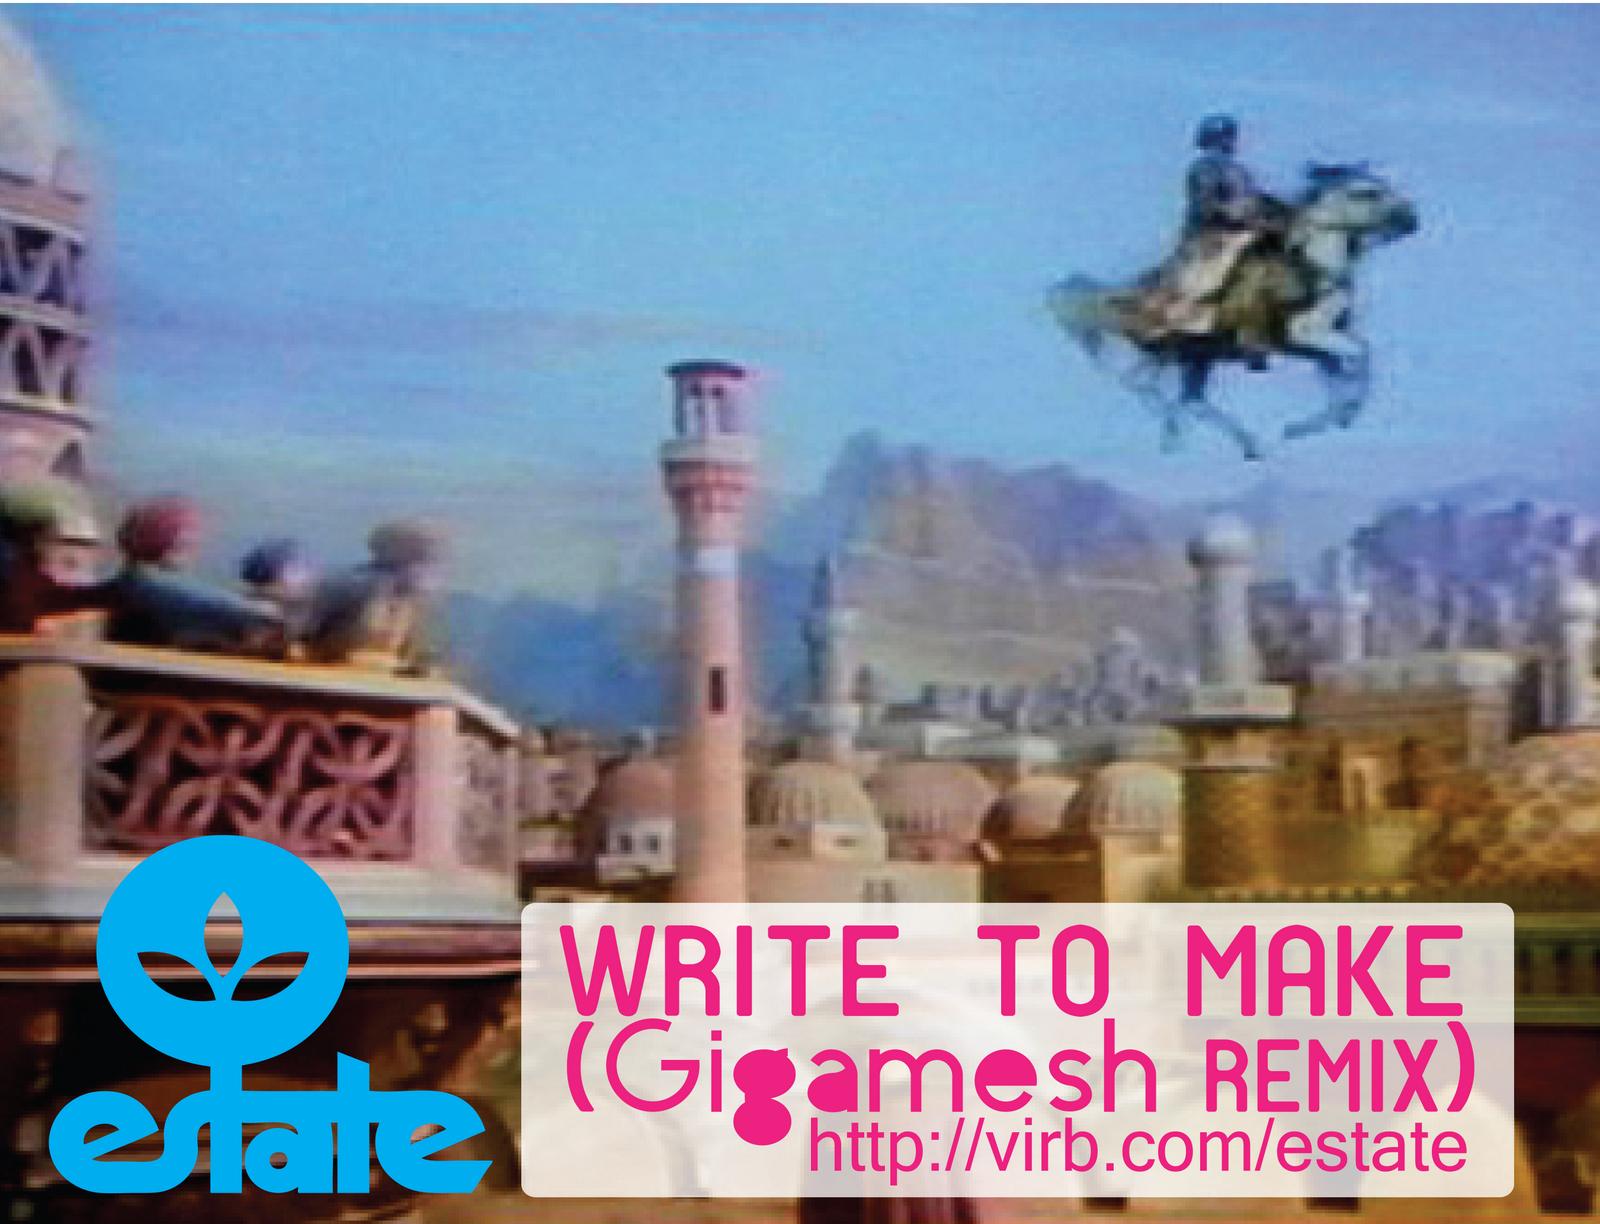 write to make gigamesh remix.jpg